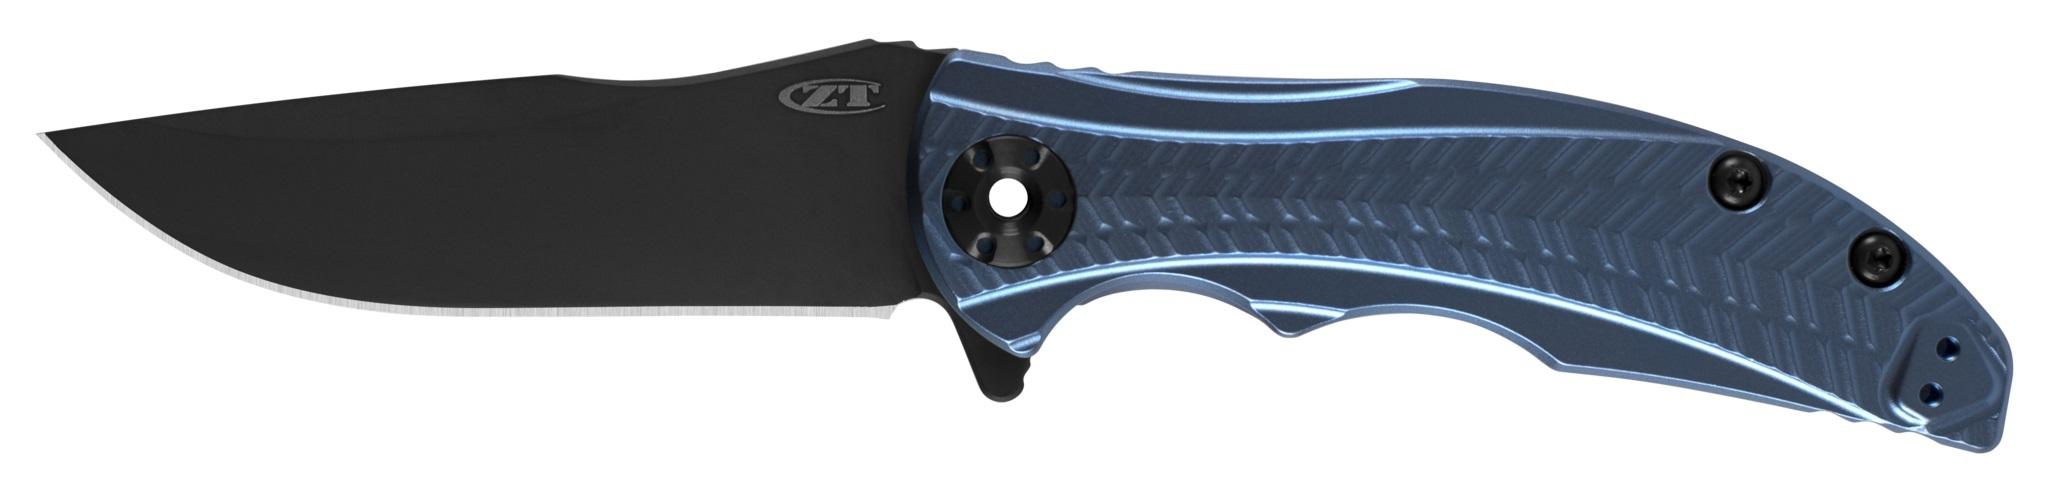 Складной нож Zero Tolerance 0609BLUBLK, сталь CPM-S35VN, покрытие Black DLC, рукоять титан